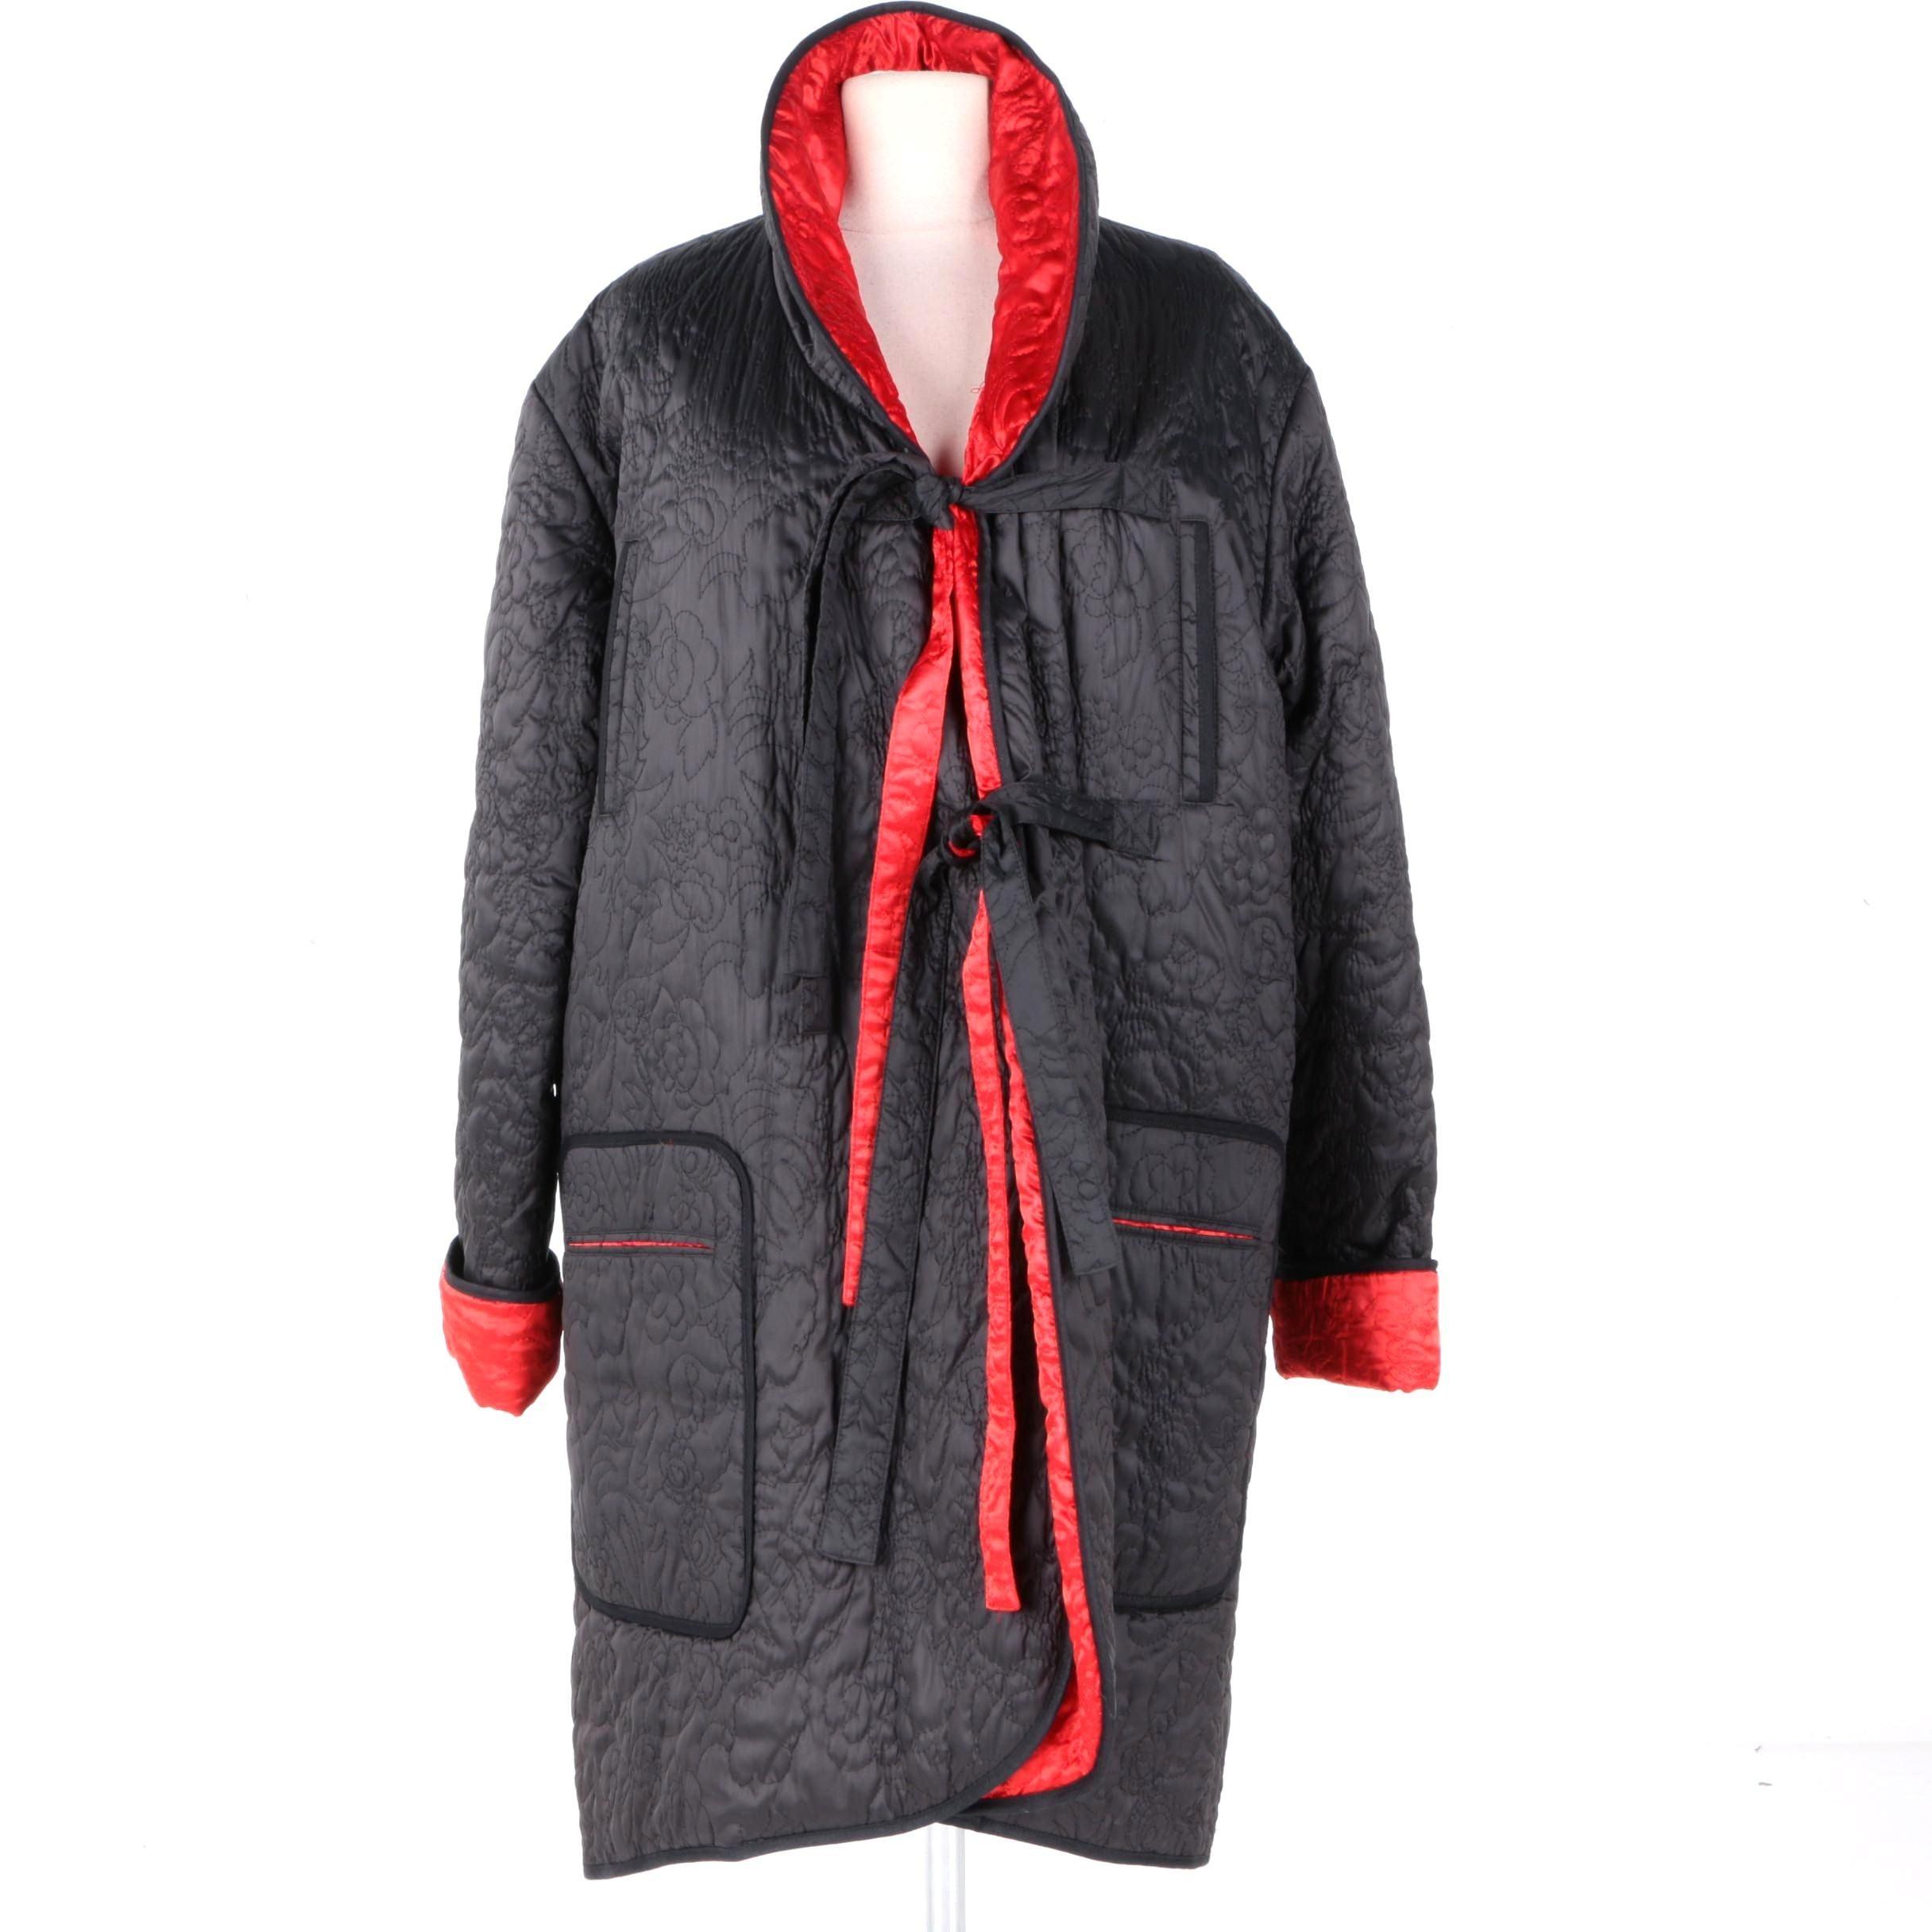 Sonia Rykiel Quilted Reversible Jacket